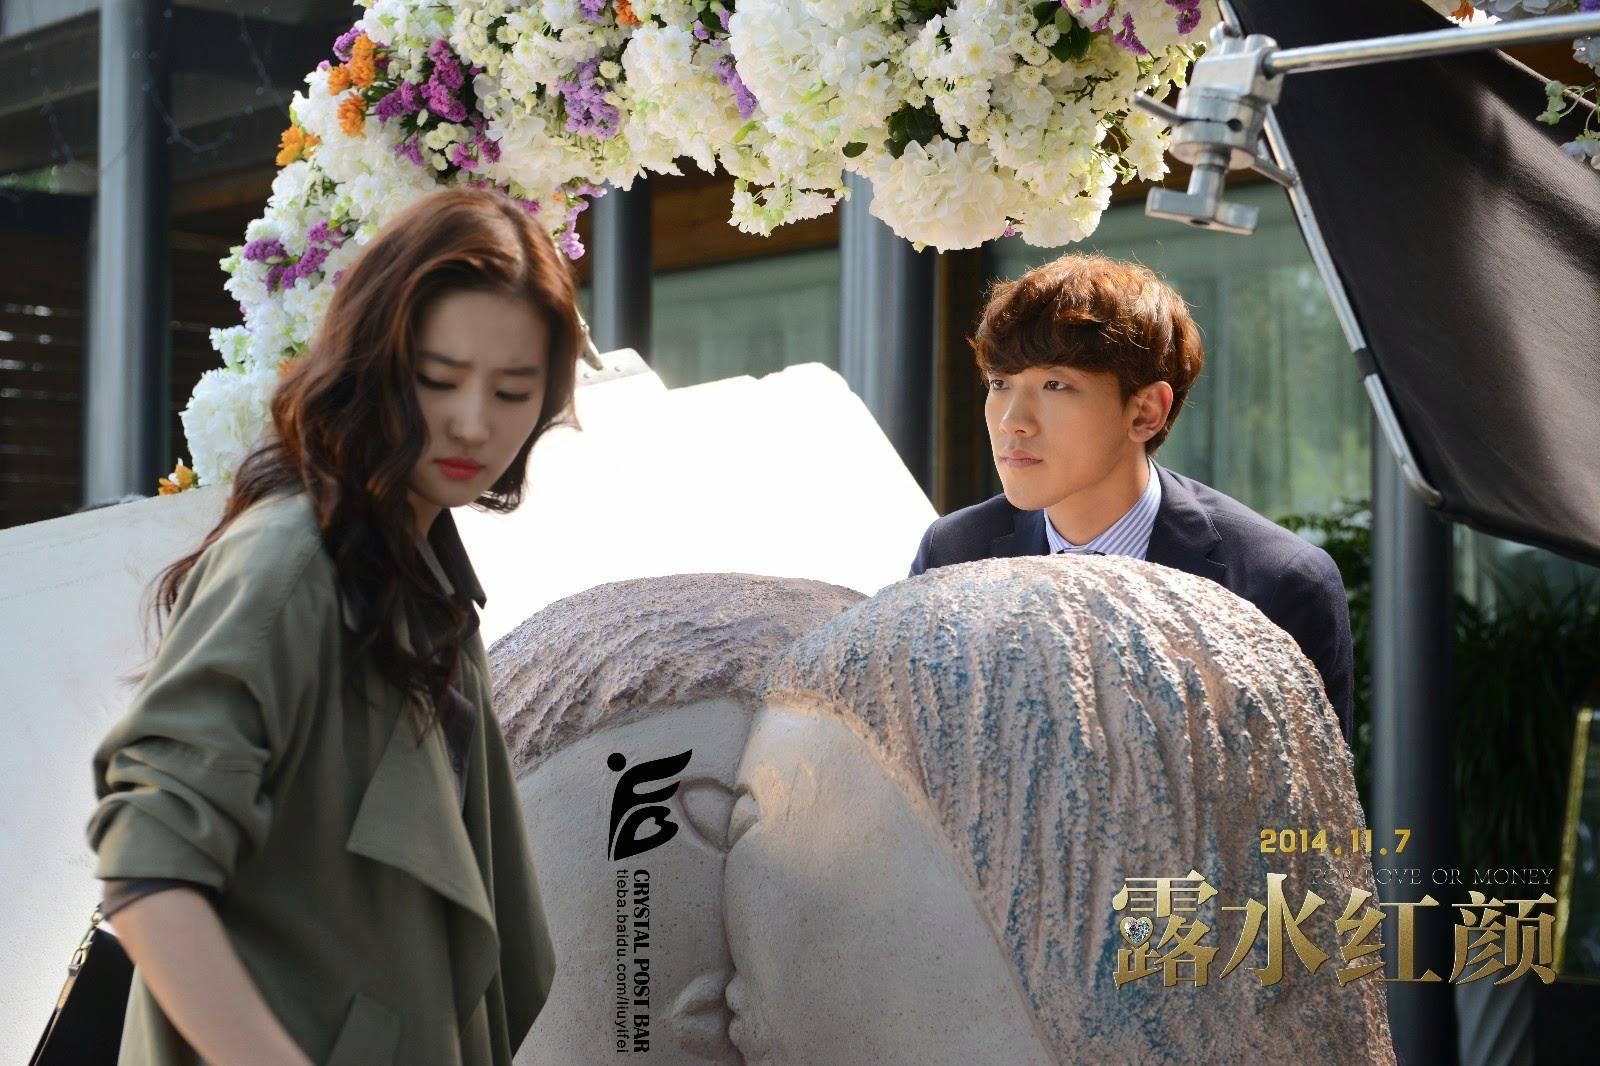 Rain 中国映画 露水紅顔_c0047605_8114648.jpg